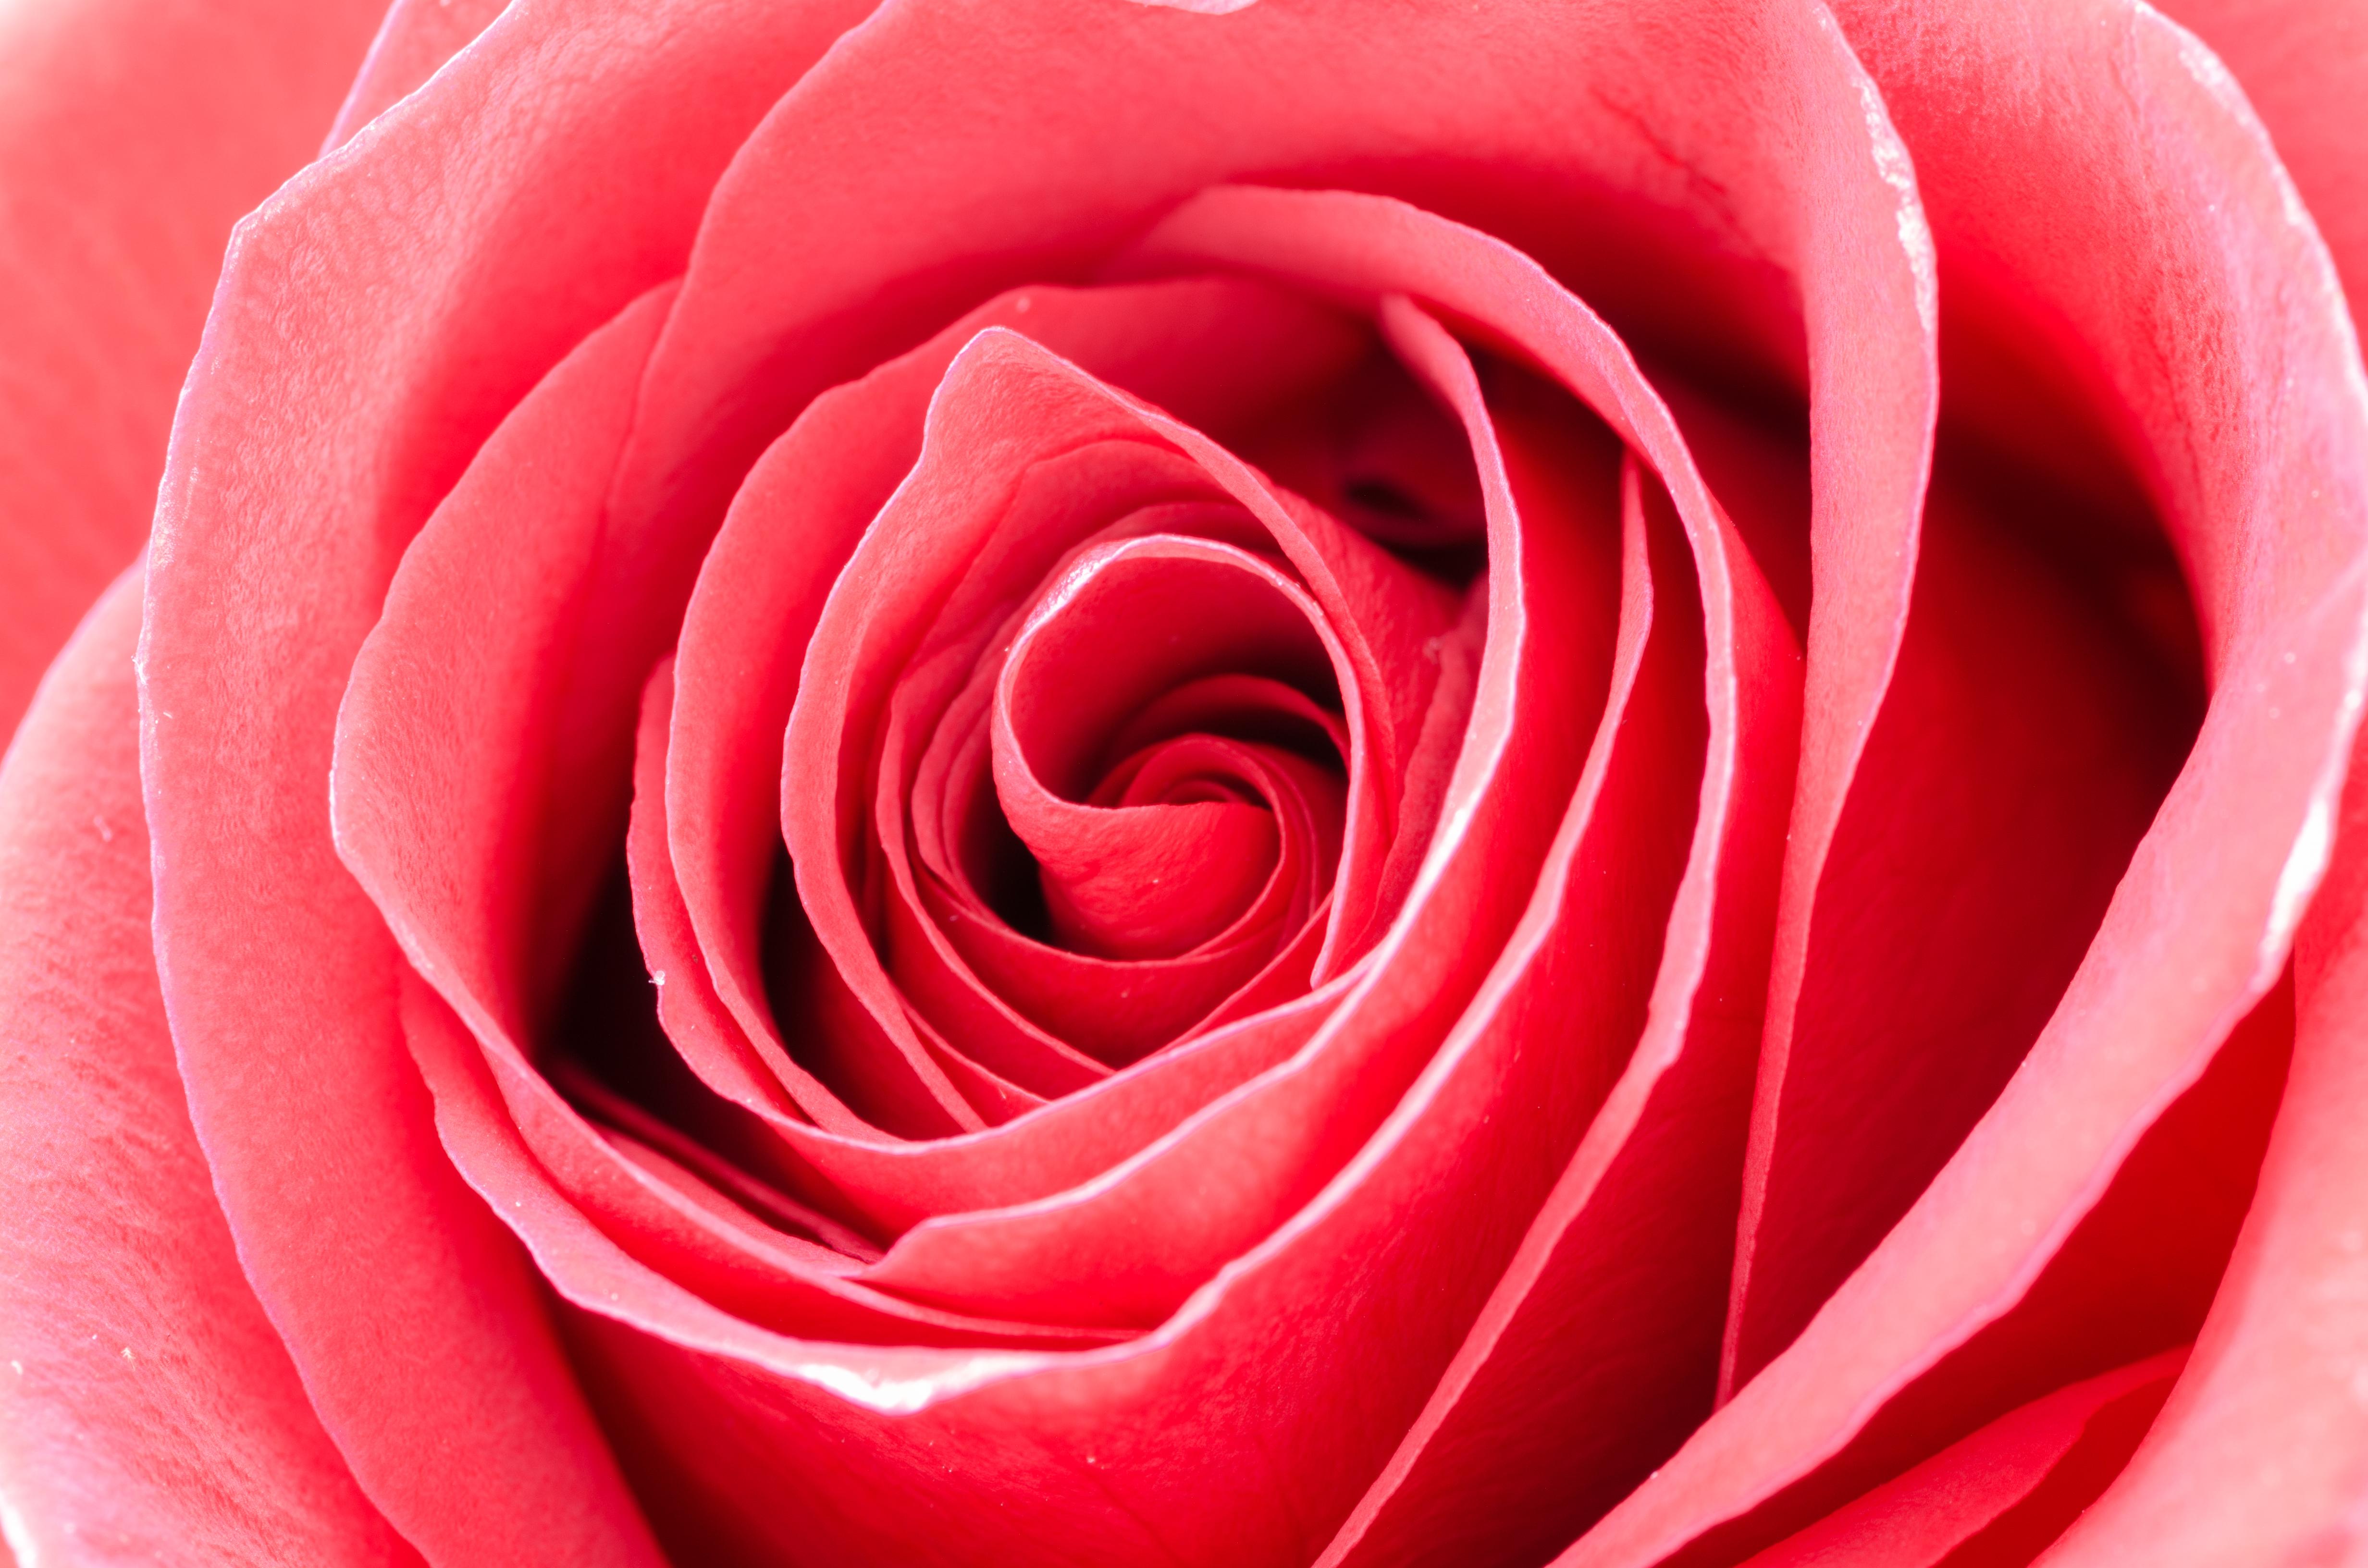 flower-rose-macro-nature-633856.jpeg (4928×3264)